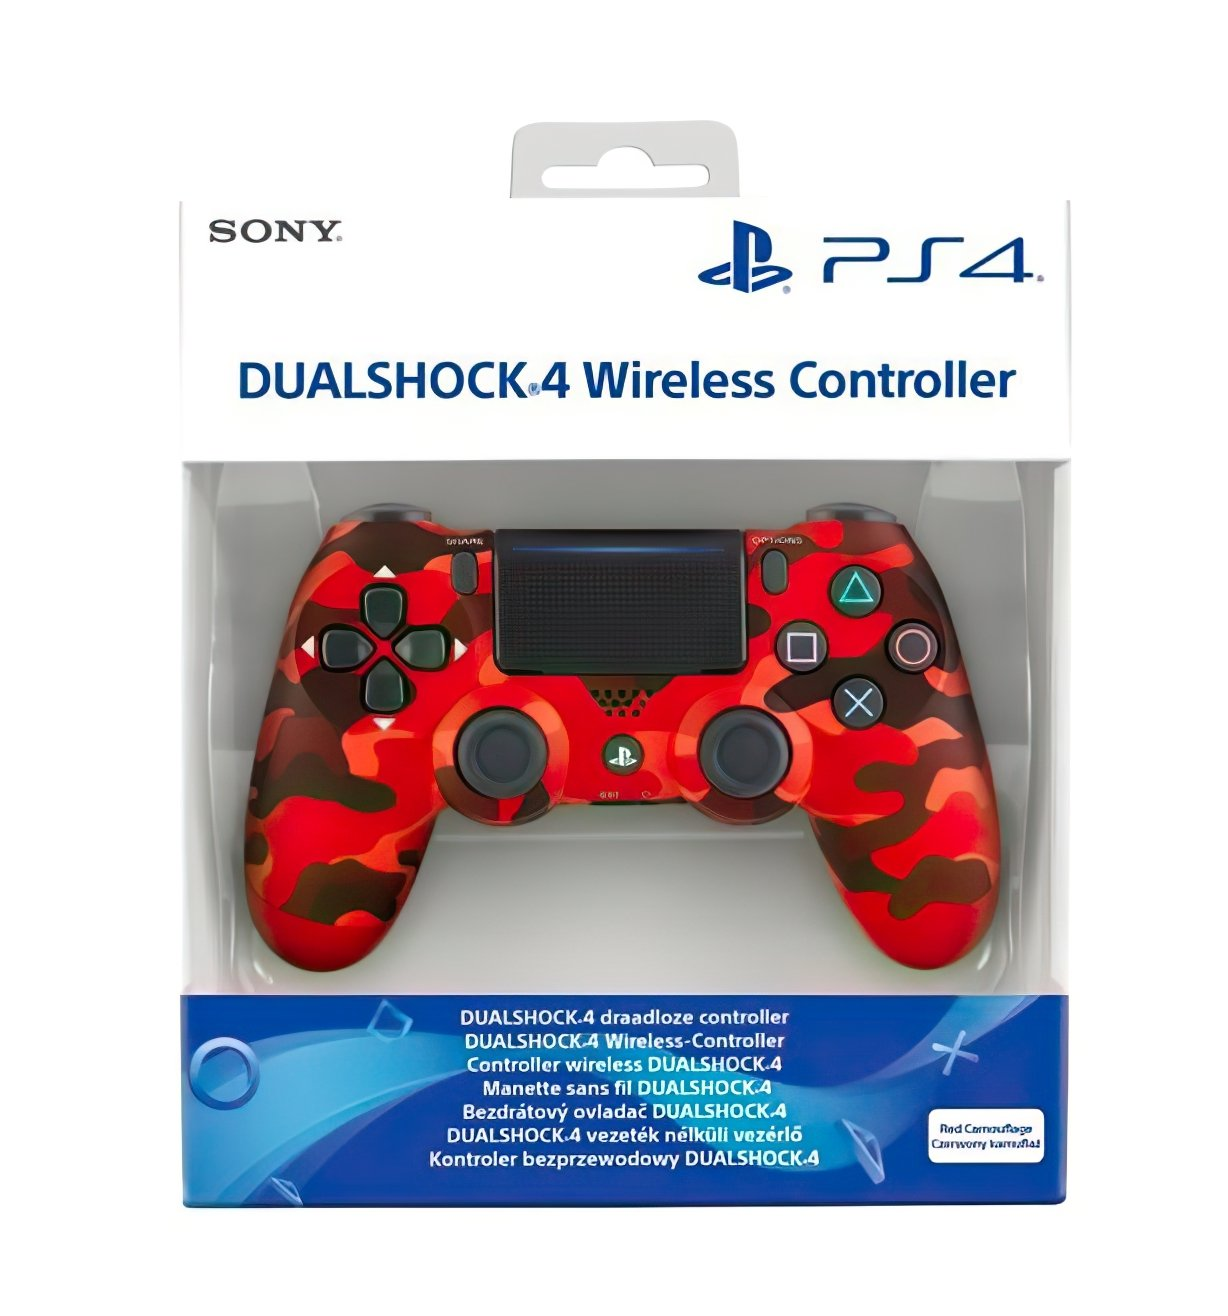 Беспроводной геймпад SONY Dualshock 4 V2 Red Camouflage (9950004) фото 5